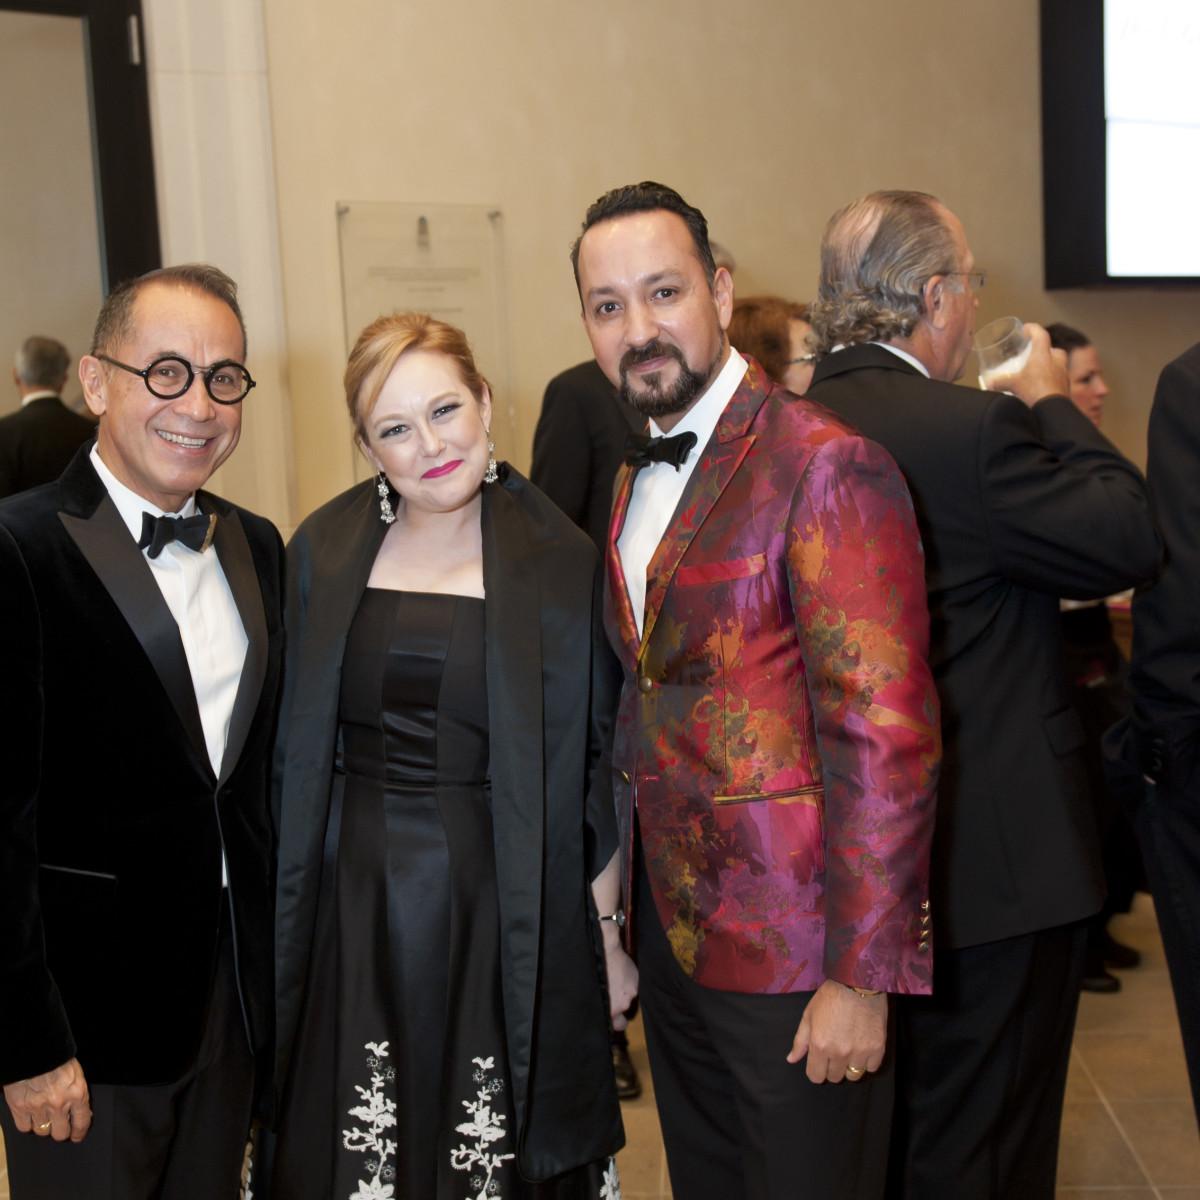 Agustin Arteaga, Amanda Dotseth, Carlos Gonzalez-Jaime